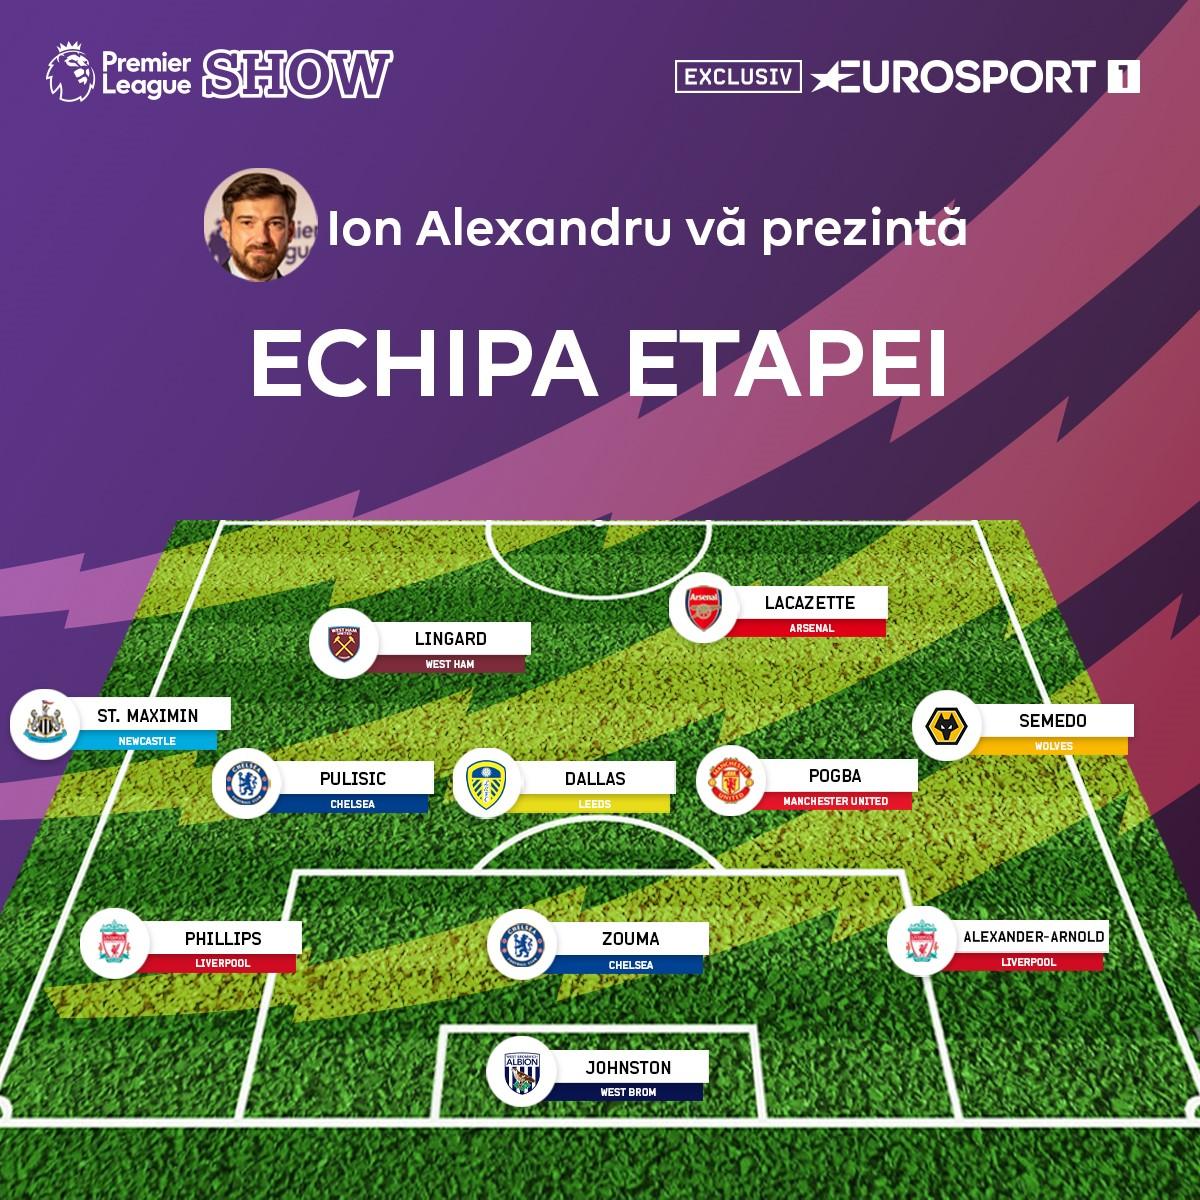 https://i.eurosport.com/2021/04/13/3062804.jpg